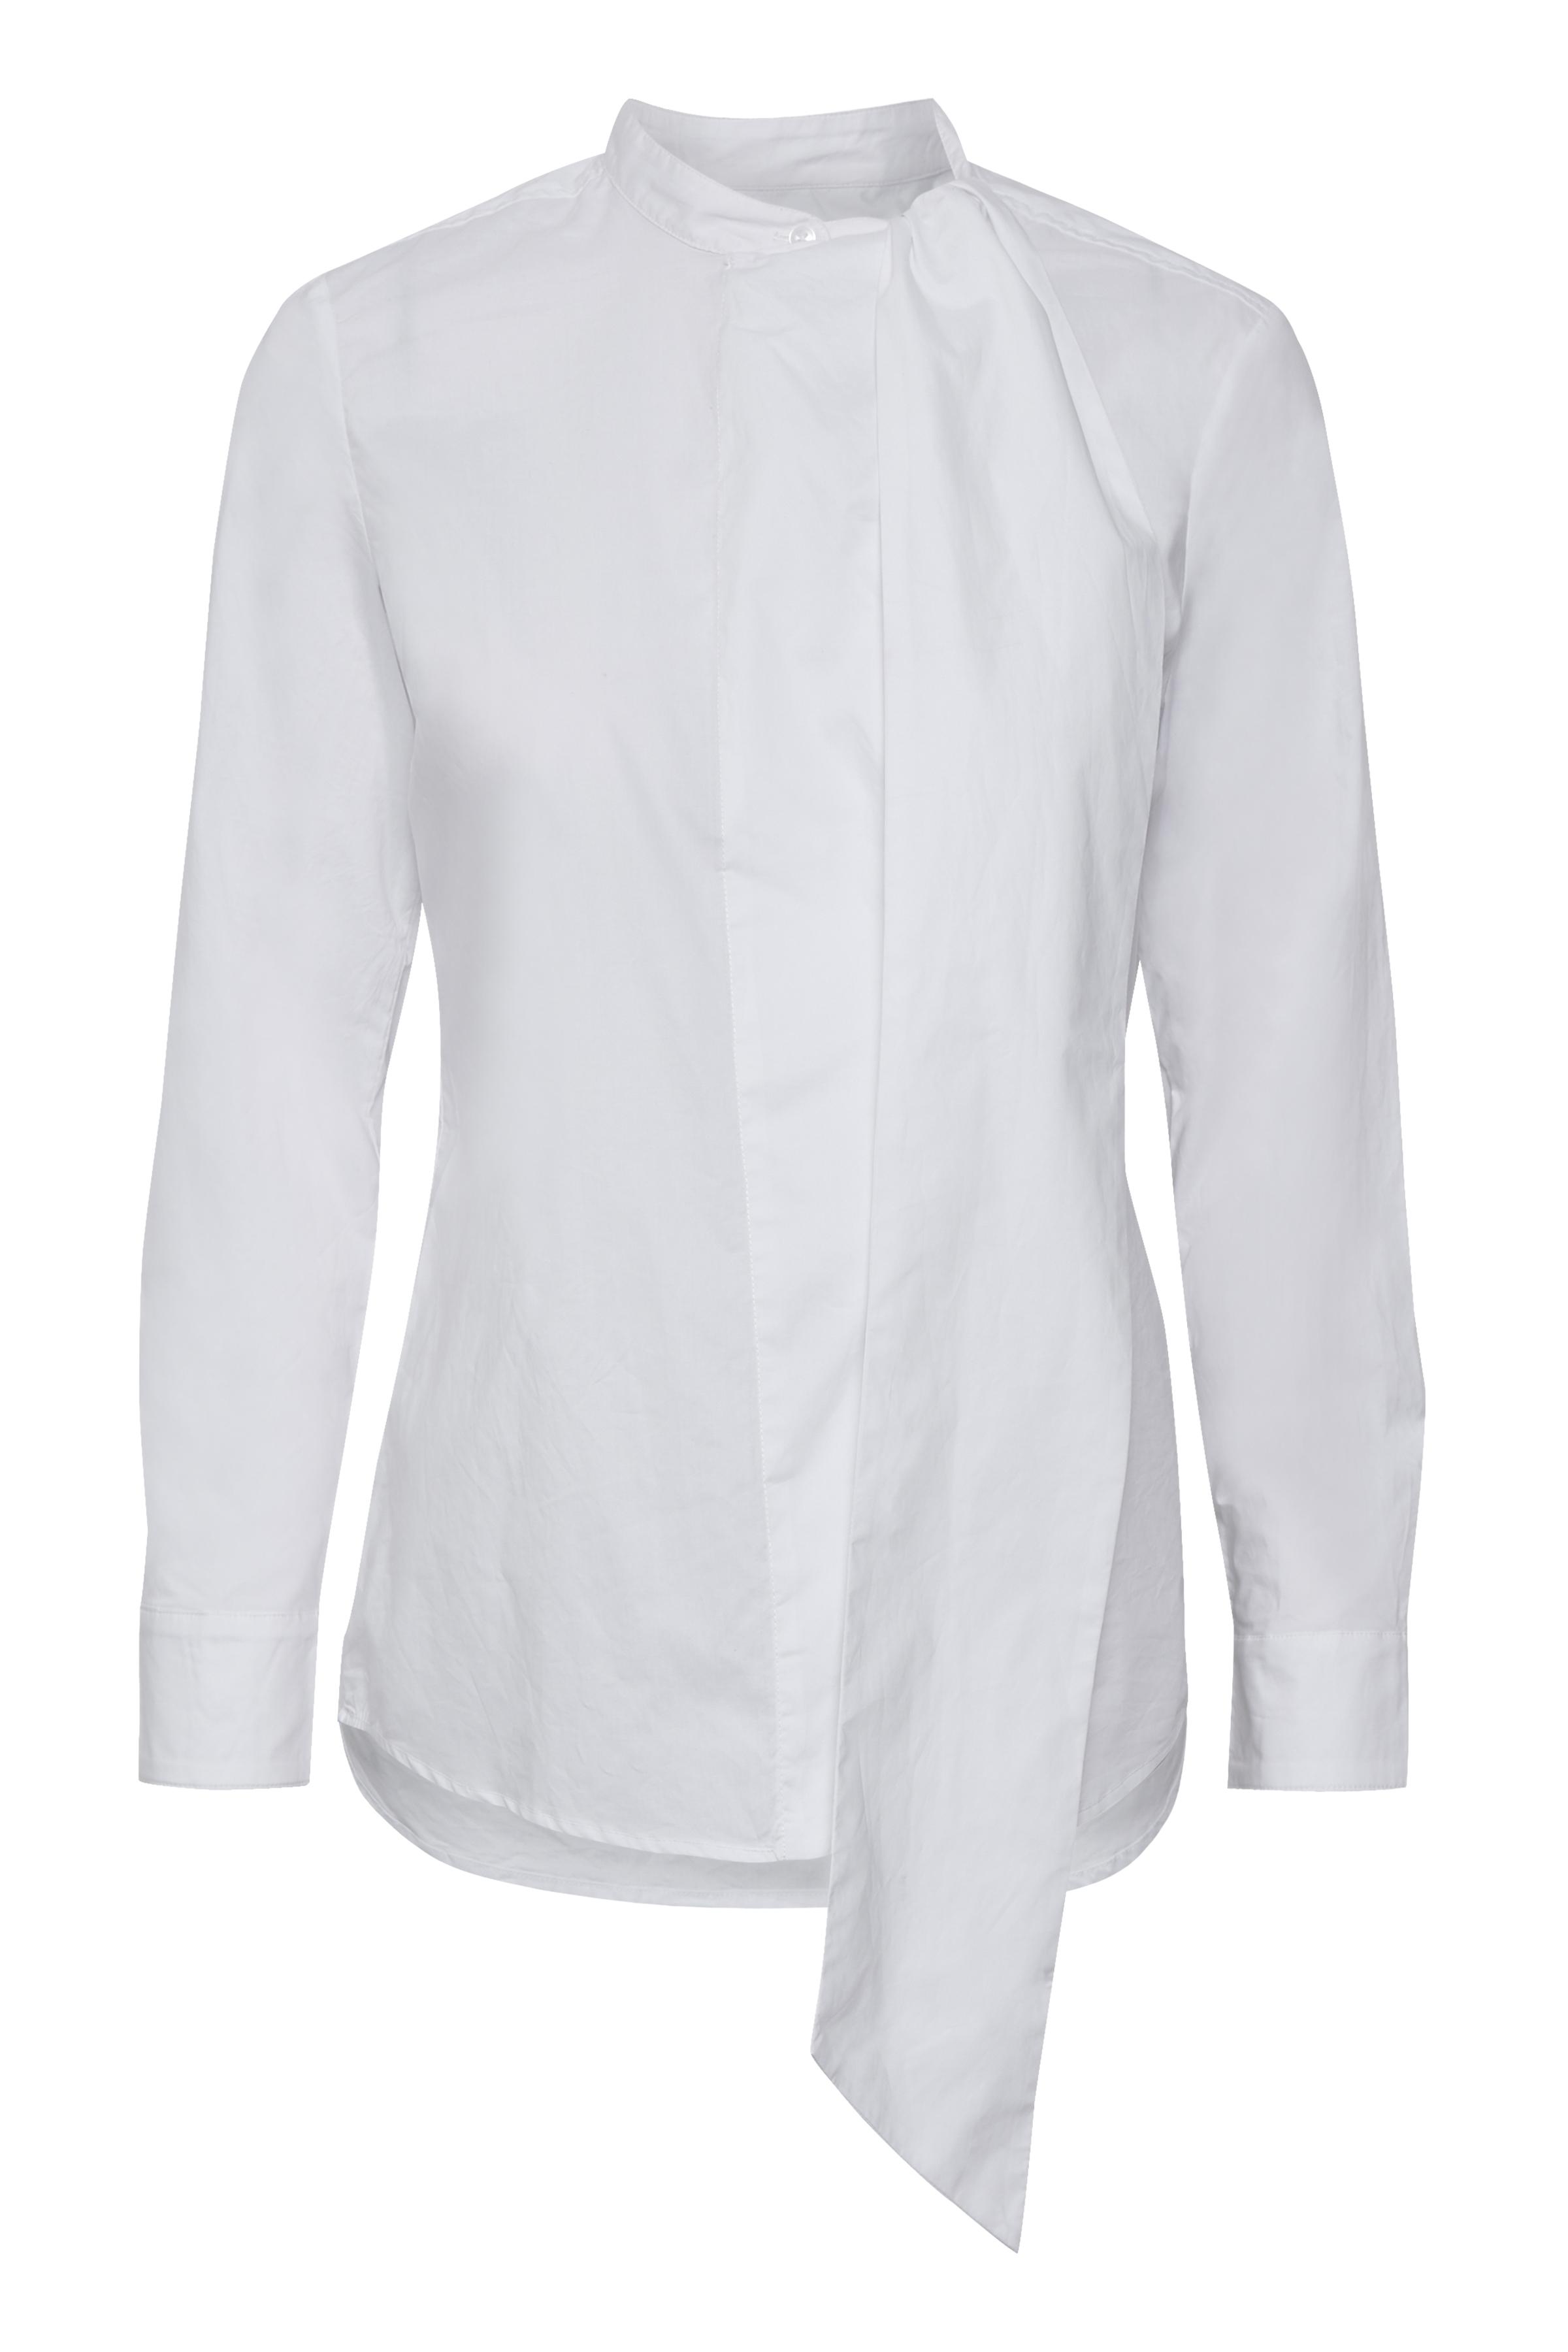 Pure White Langærmet skjorte – Køb Pure White Langærmet skjorte fra str. 34-42 her